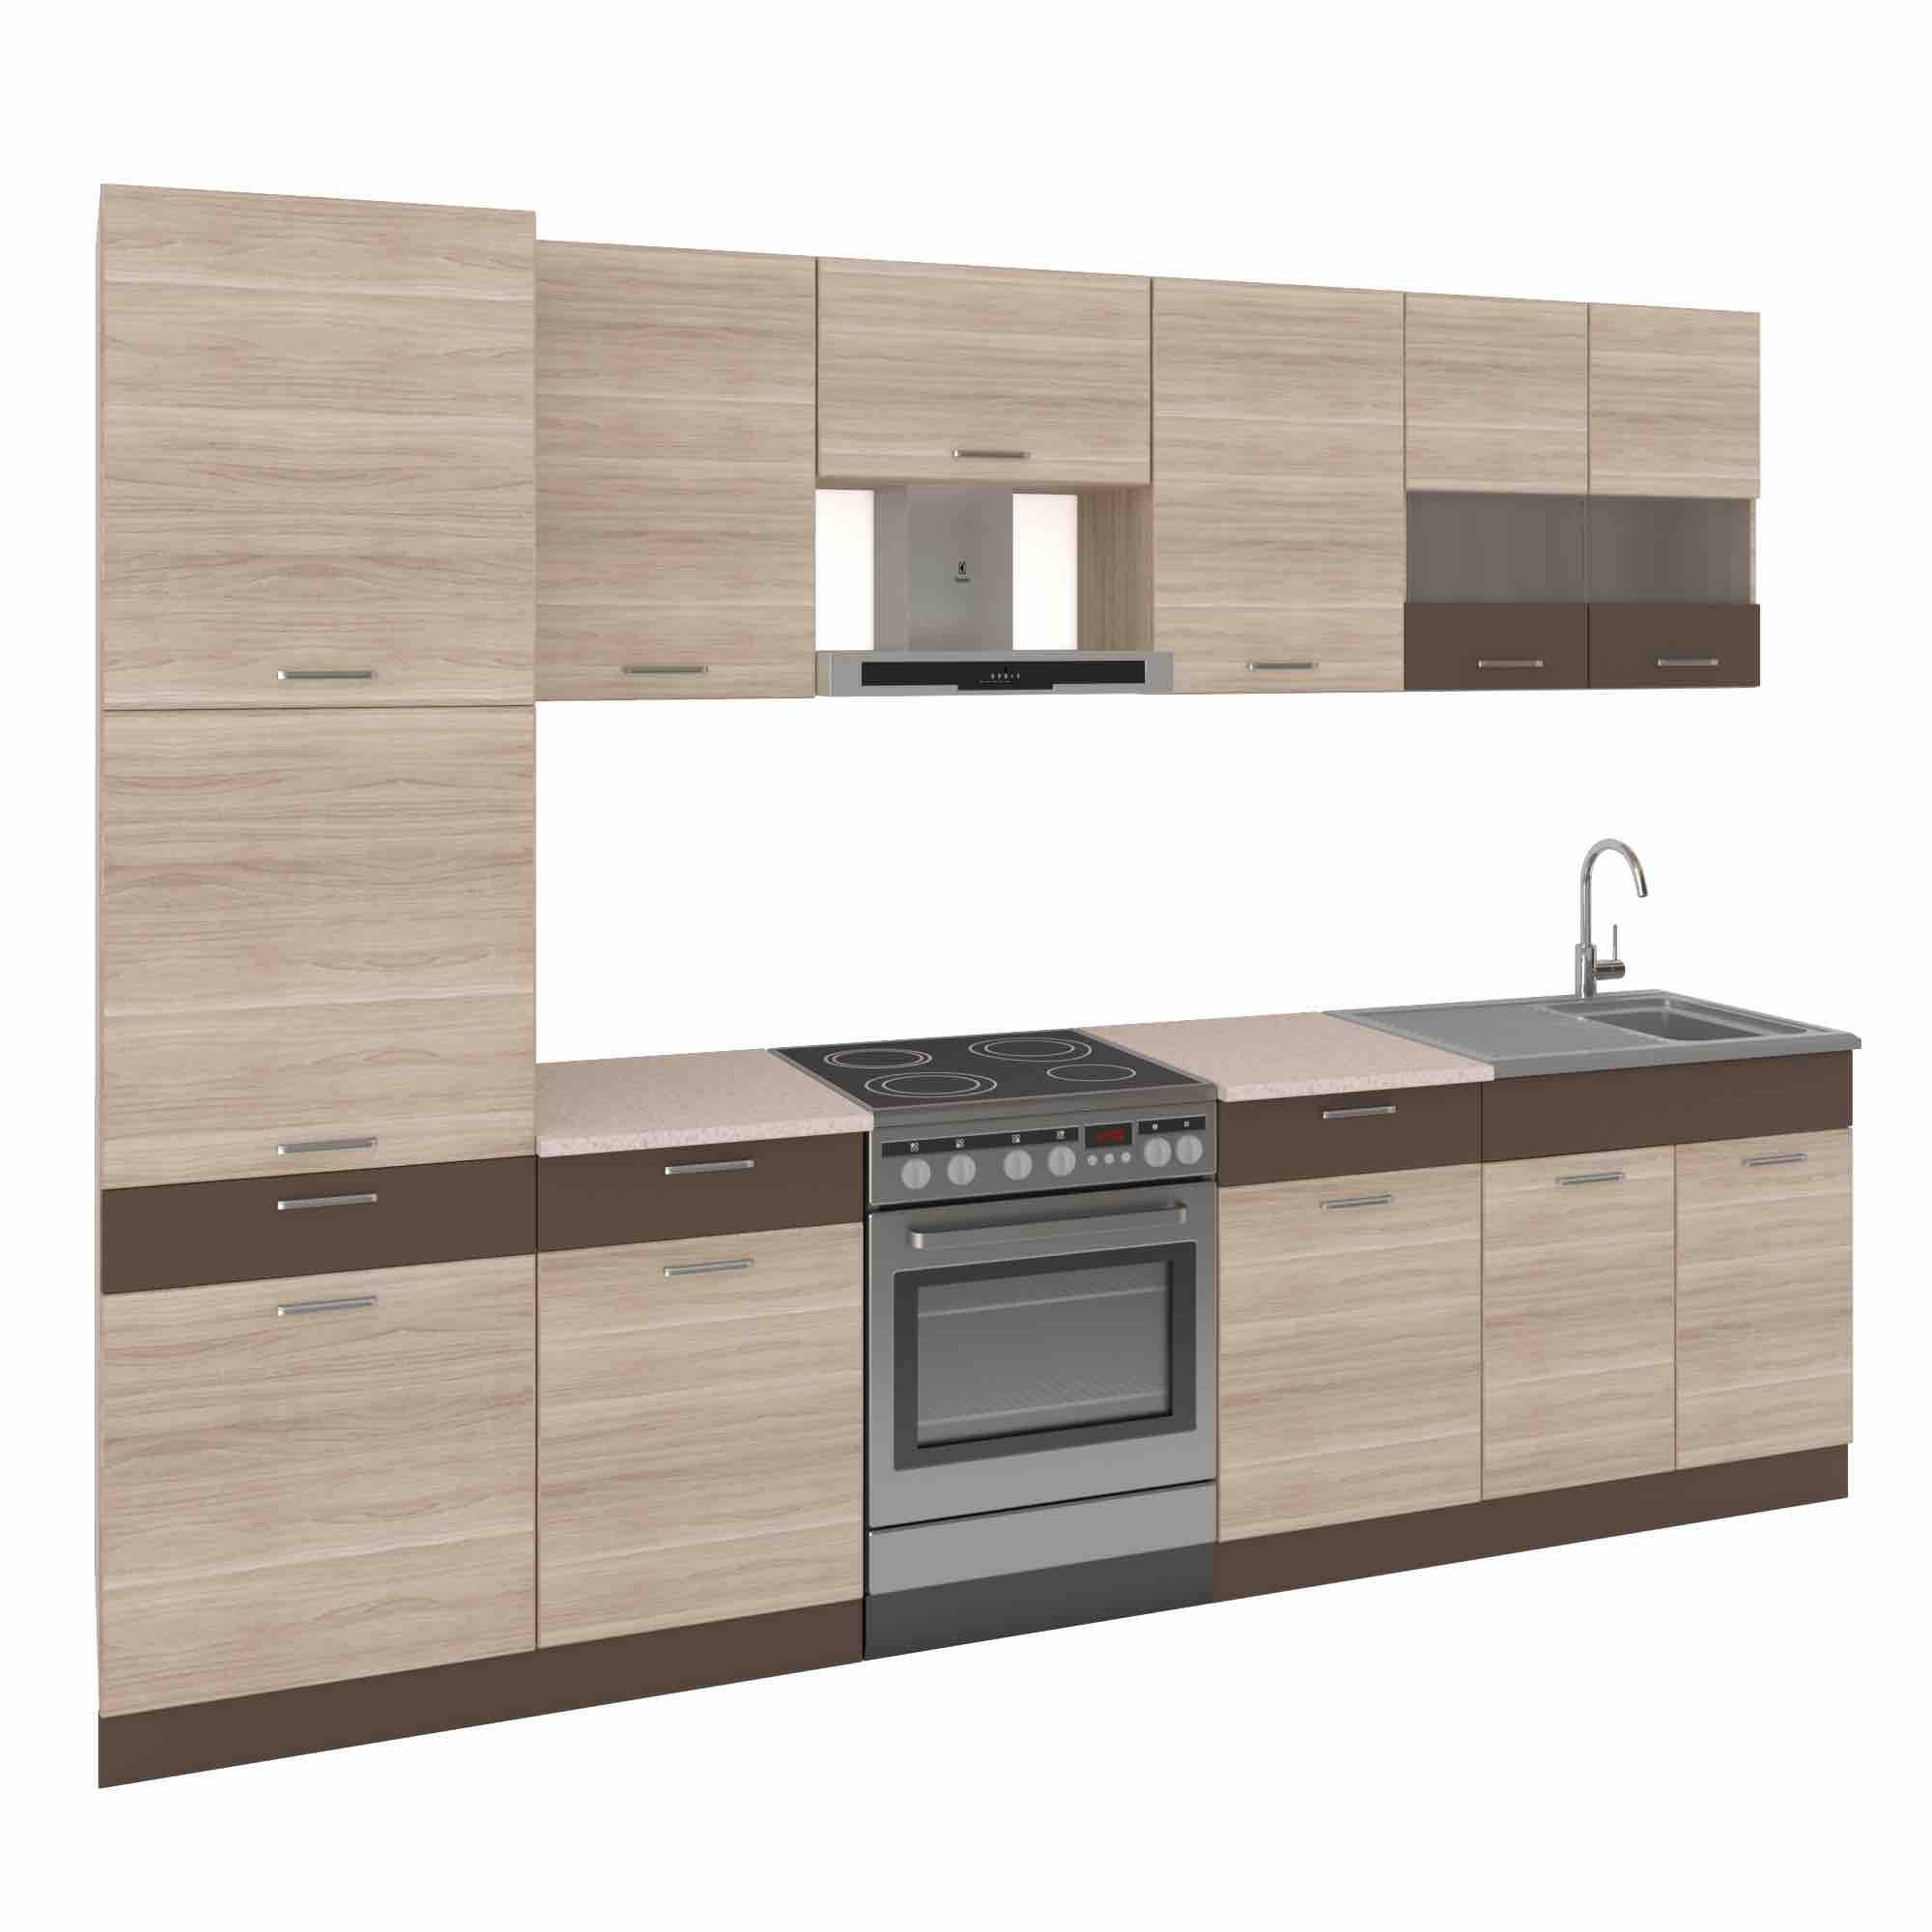 arbeitsplatte k che befestigen arbeitsplatte k che. Black Bedroom Furniture Sets. Home Design Ideas